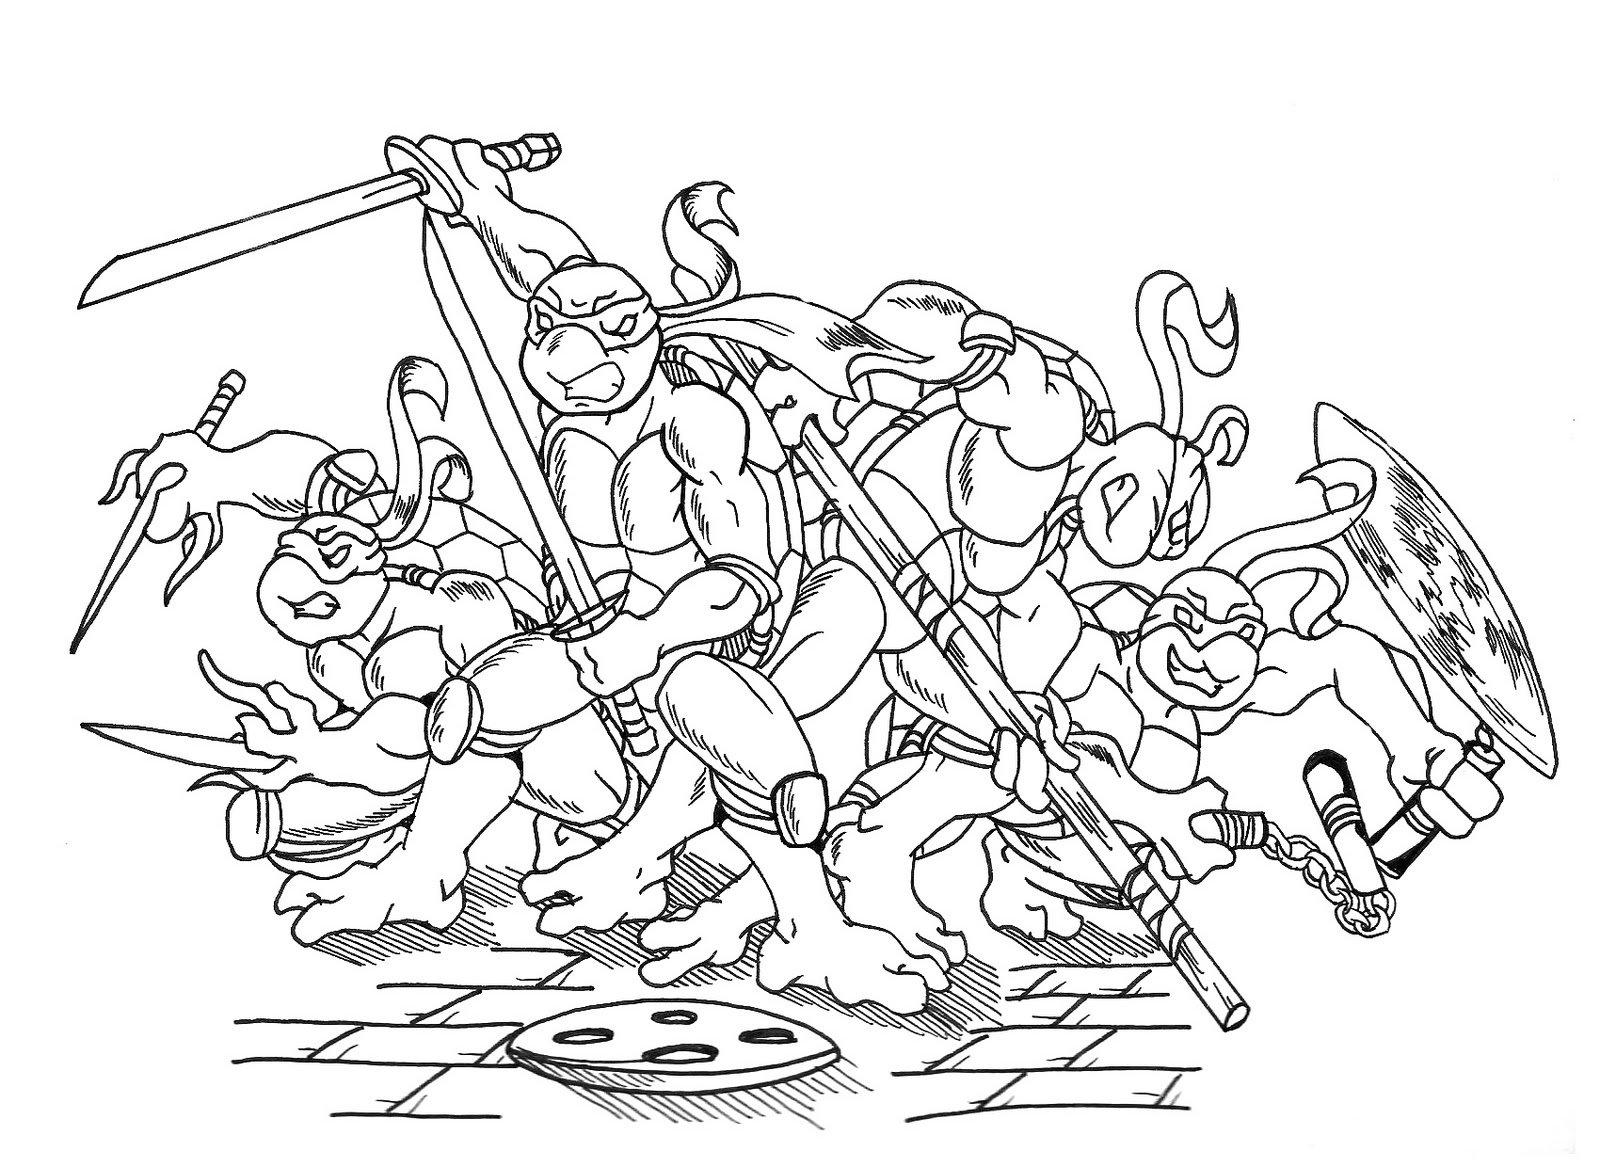 Novo Desenhos Para Imprimir E Colorir Das Tartarugas Ninjas